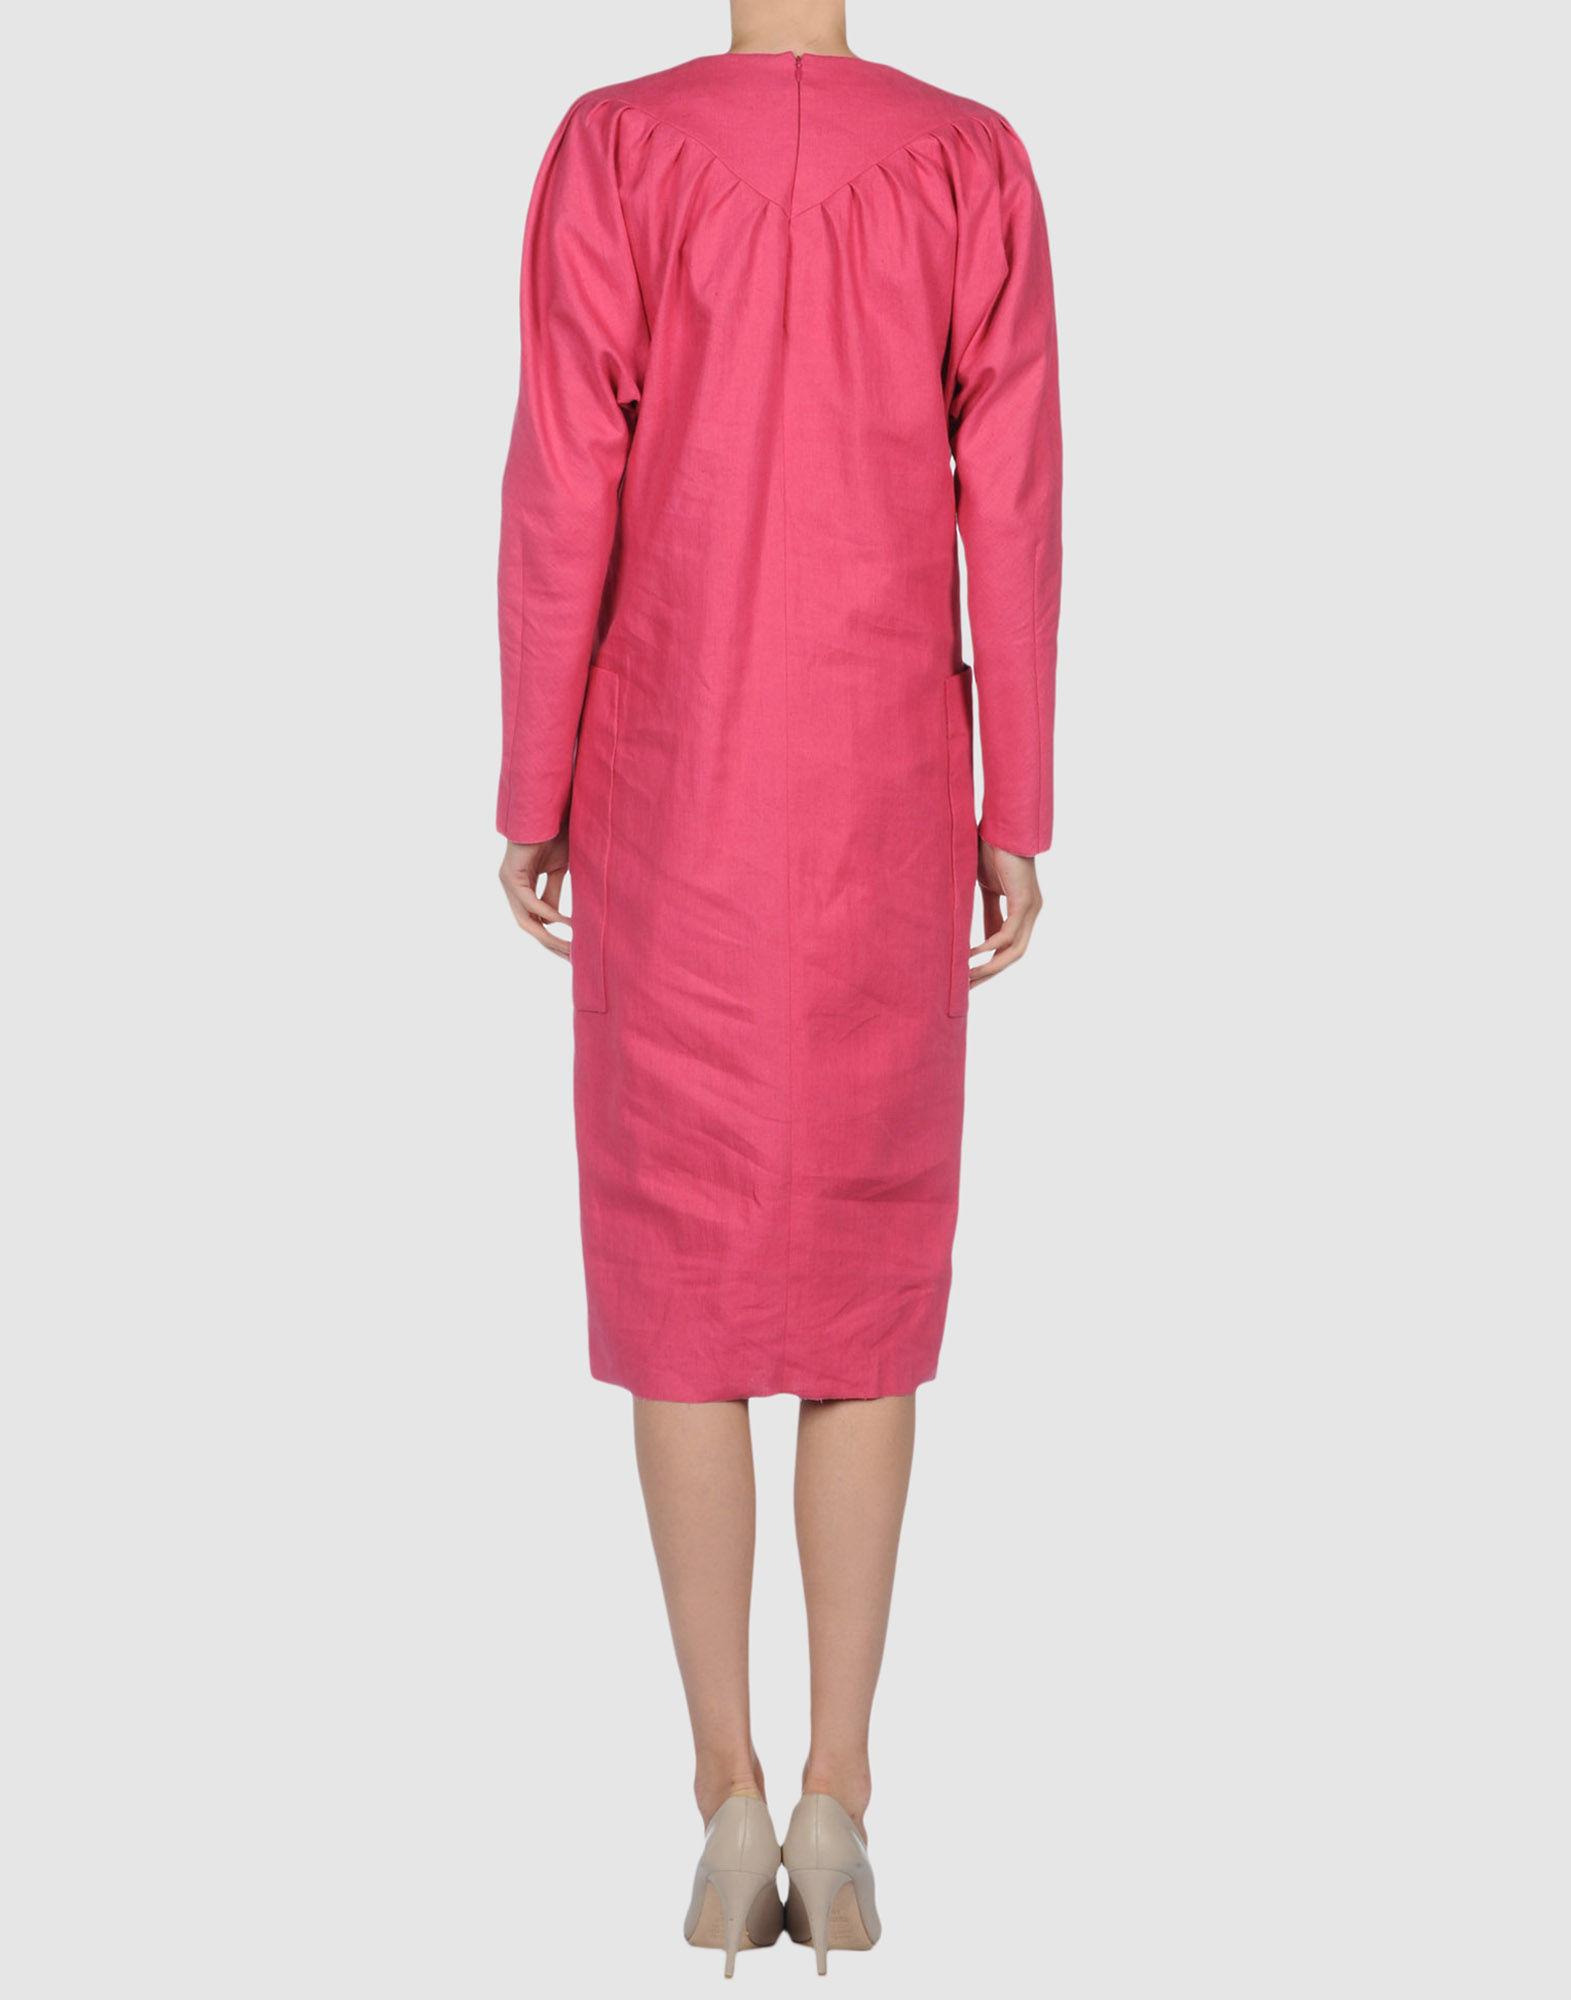 34225455MX 14 r - Βραδυνα Φορεματα Yves Saint Laurent Rive Gauche Κωδ.15